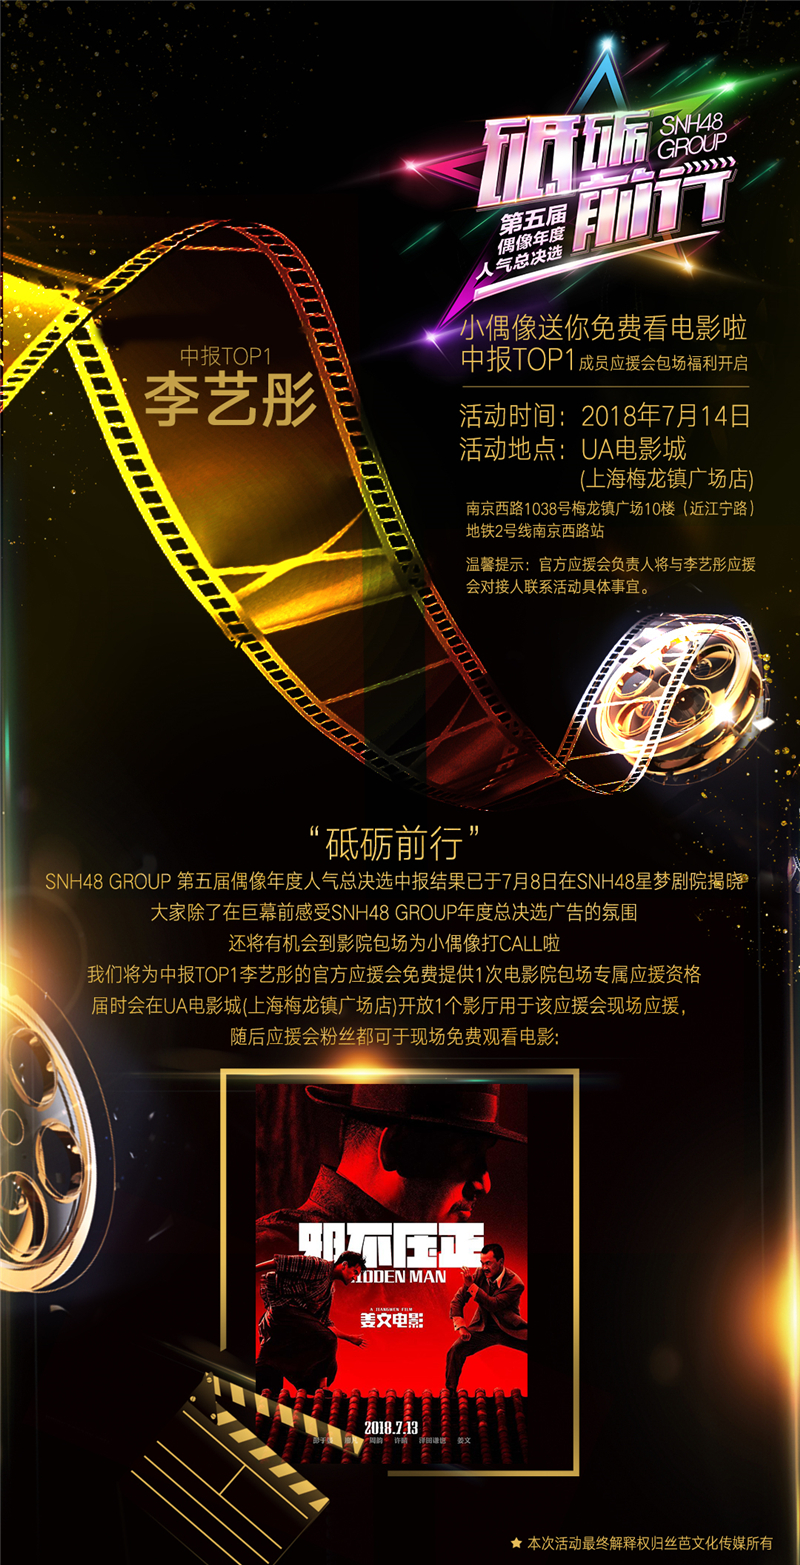 SNH48 GROUP 第五届偶像年度人气总决选中报单推王公布